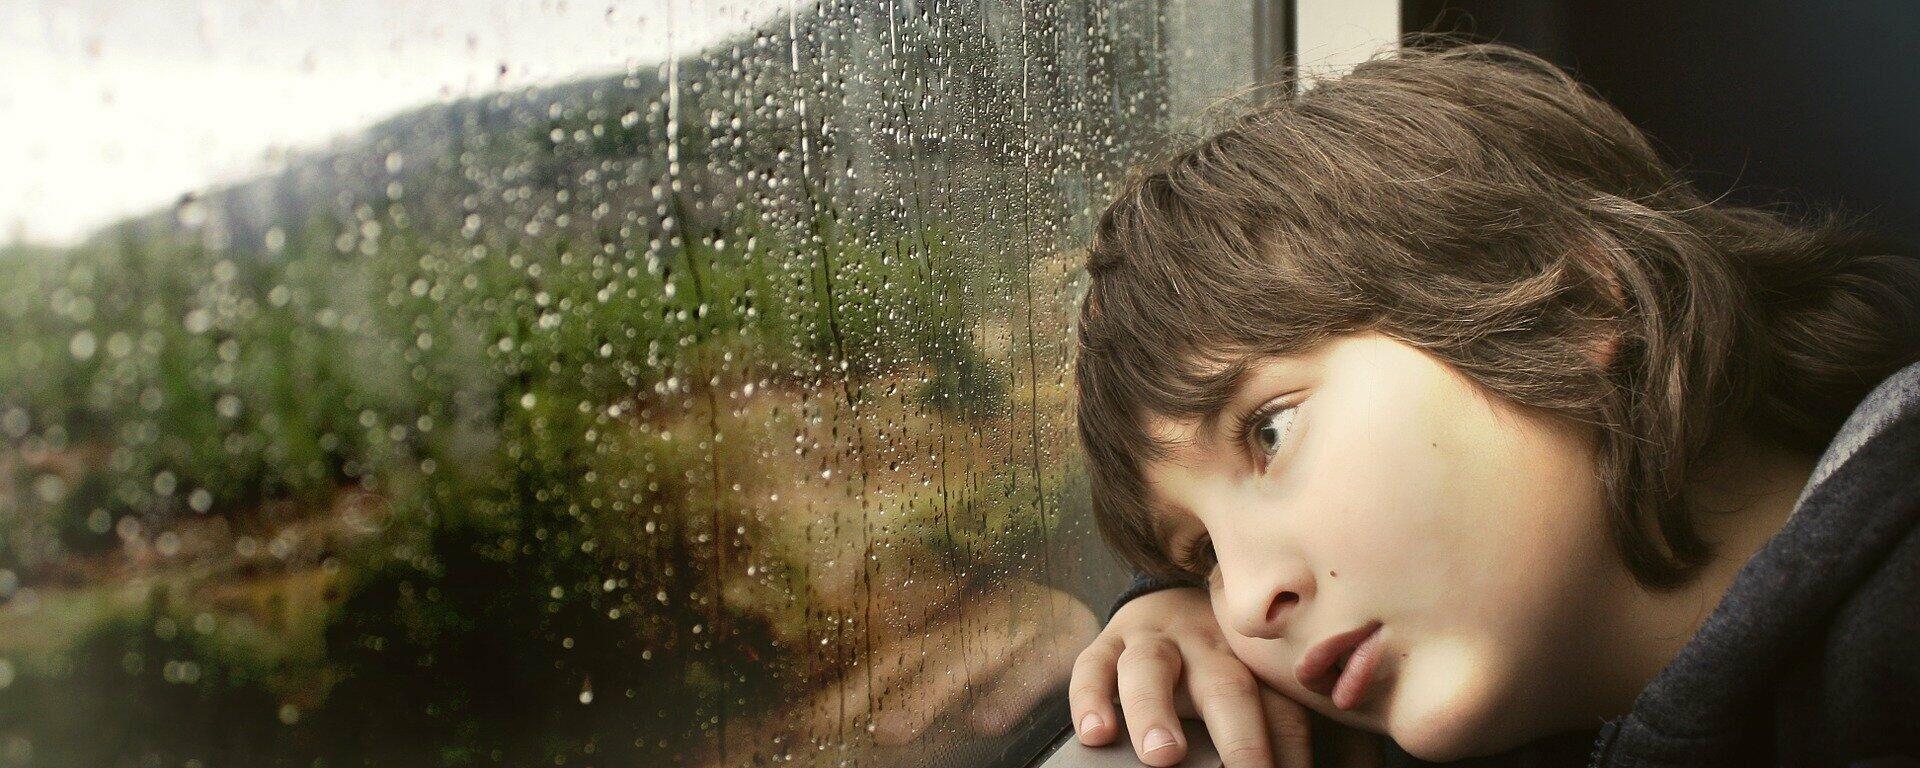 Kind am Fenster (Symbolbild) - SNA, 1920, 30.08.2021